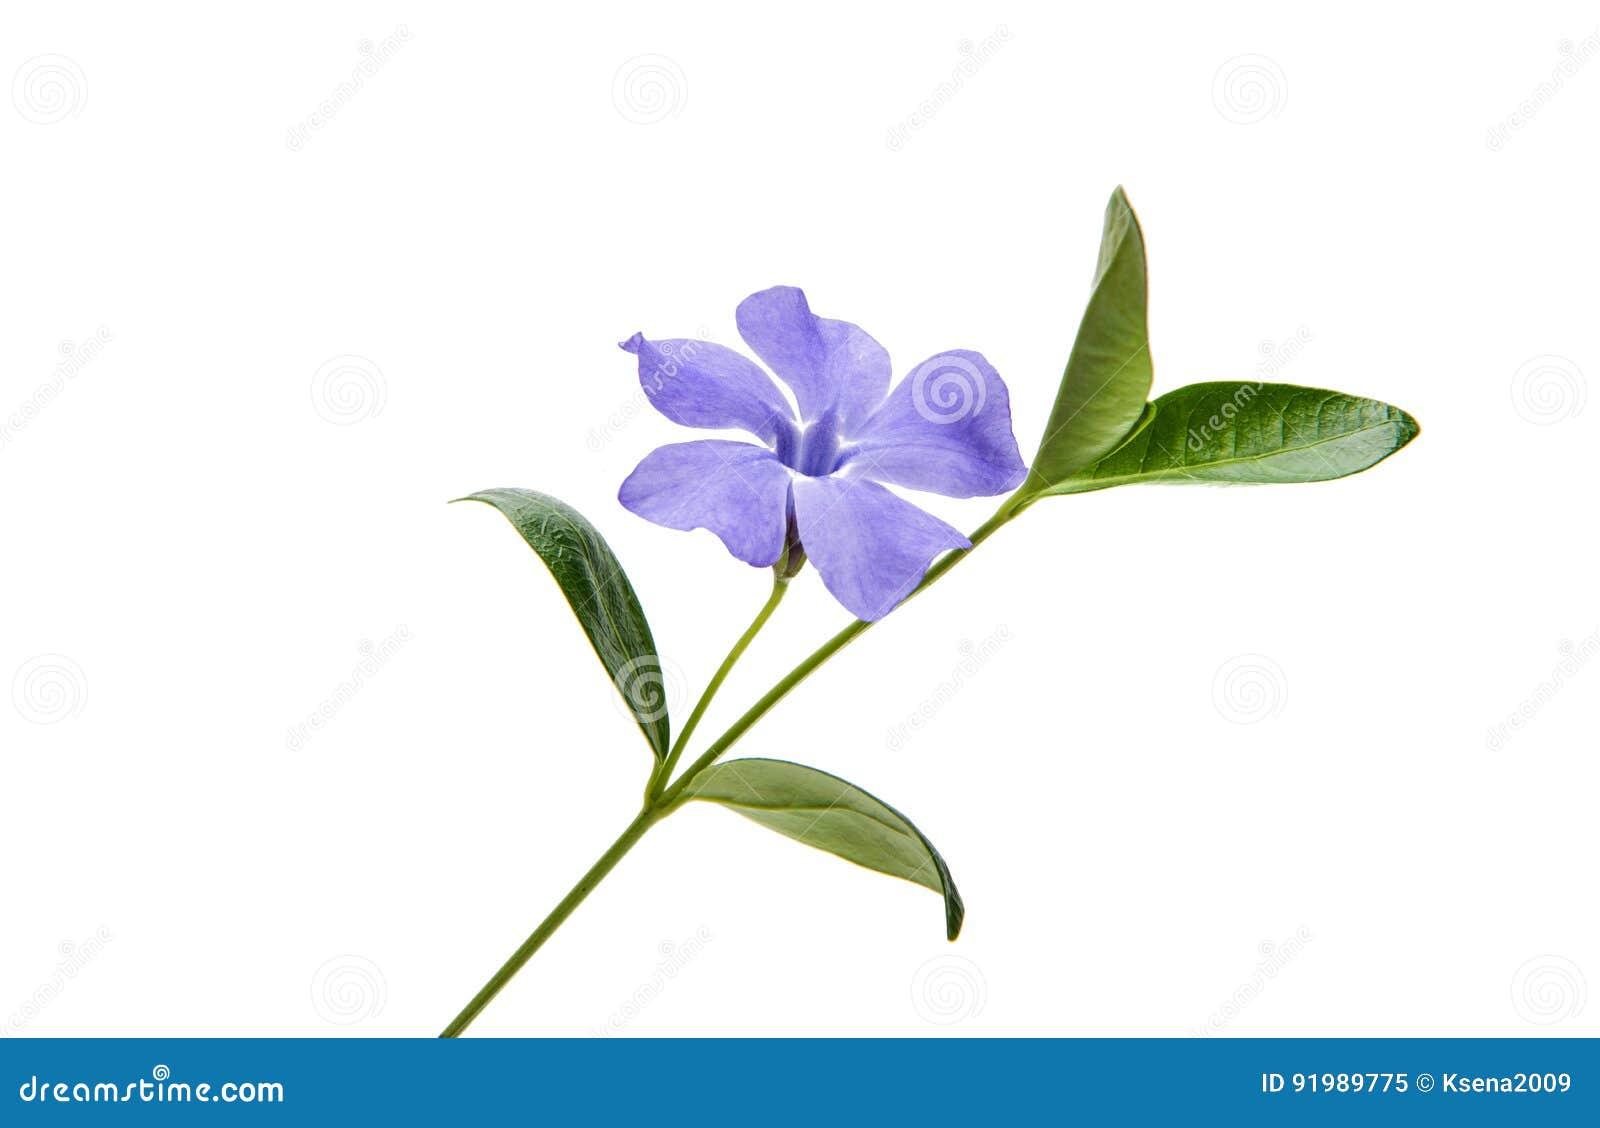 Navy blue flower vinca stock image image of medicinal 91989775 flower vinca on a white background izmirmasajfo